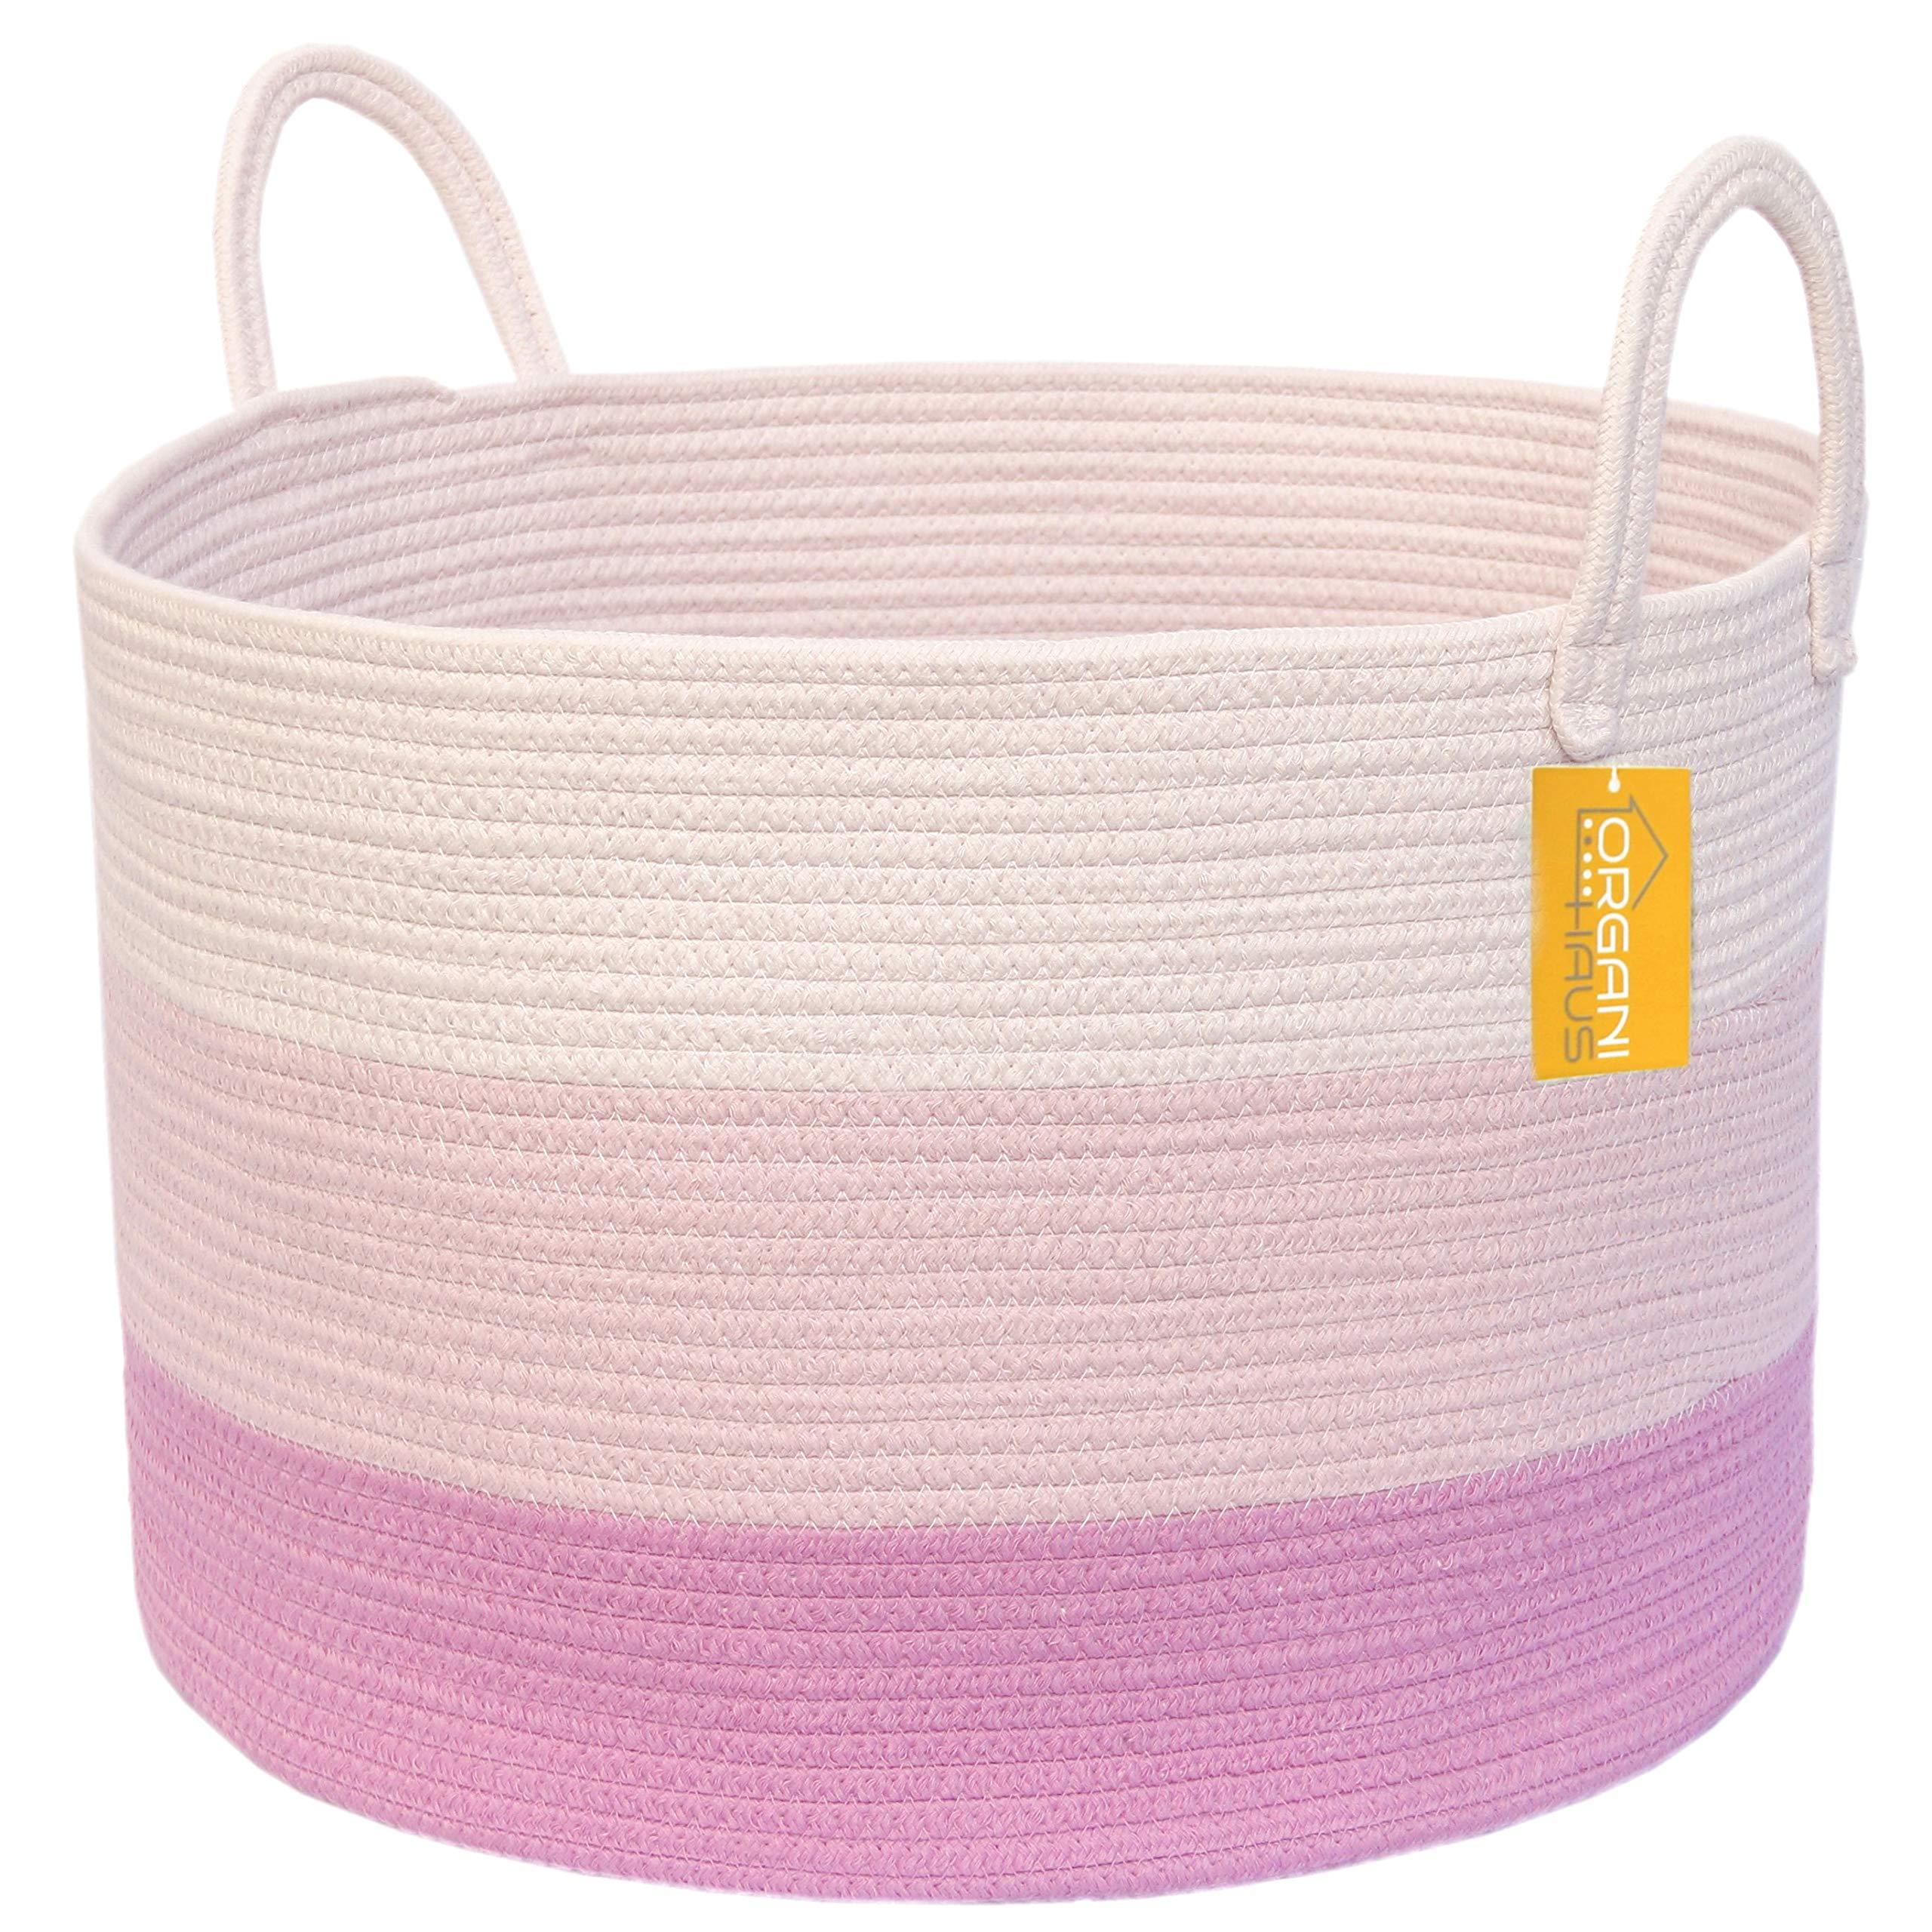 OrganiHaus XXL Extra Large Cotton Rope Basket | 20''x13.5'' Blanket Storage Basket with Long Handles | Decorative Clothes Hamper Basket | Baby and Kids Room Toy Bin | Blanket Basket (Baby Pink)